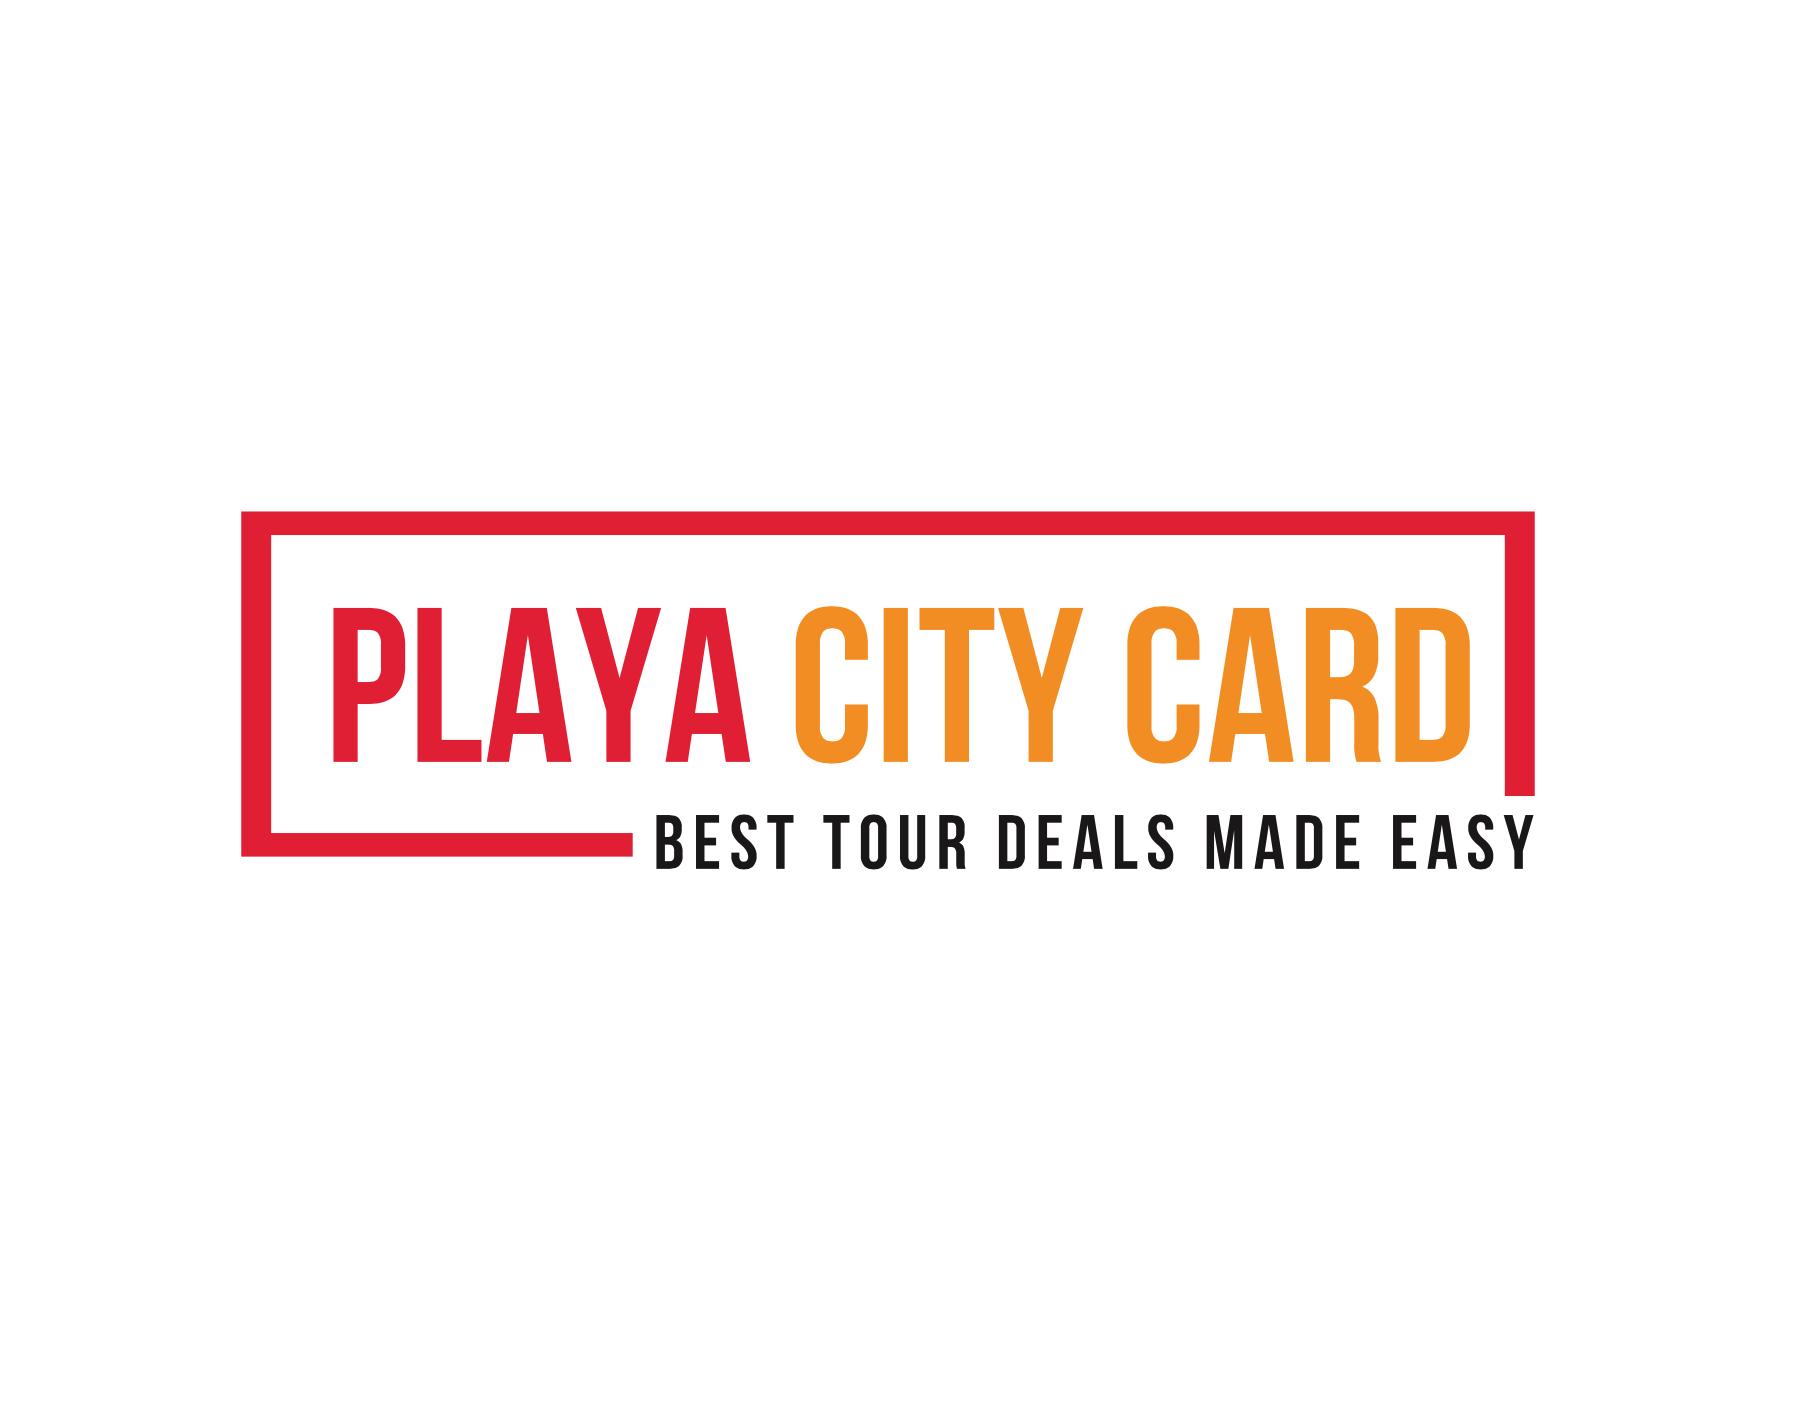 Playa City Card